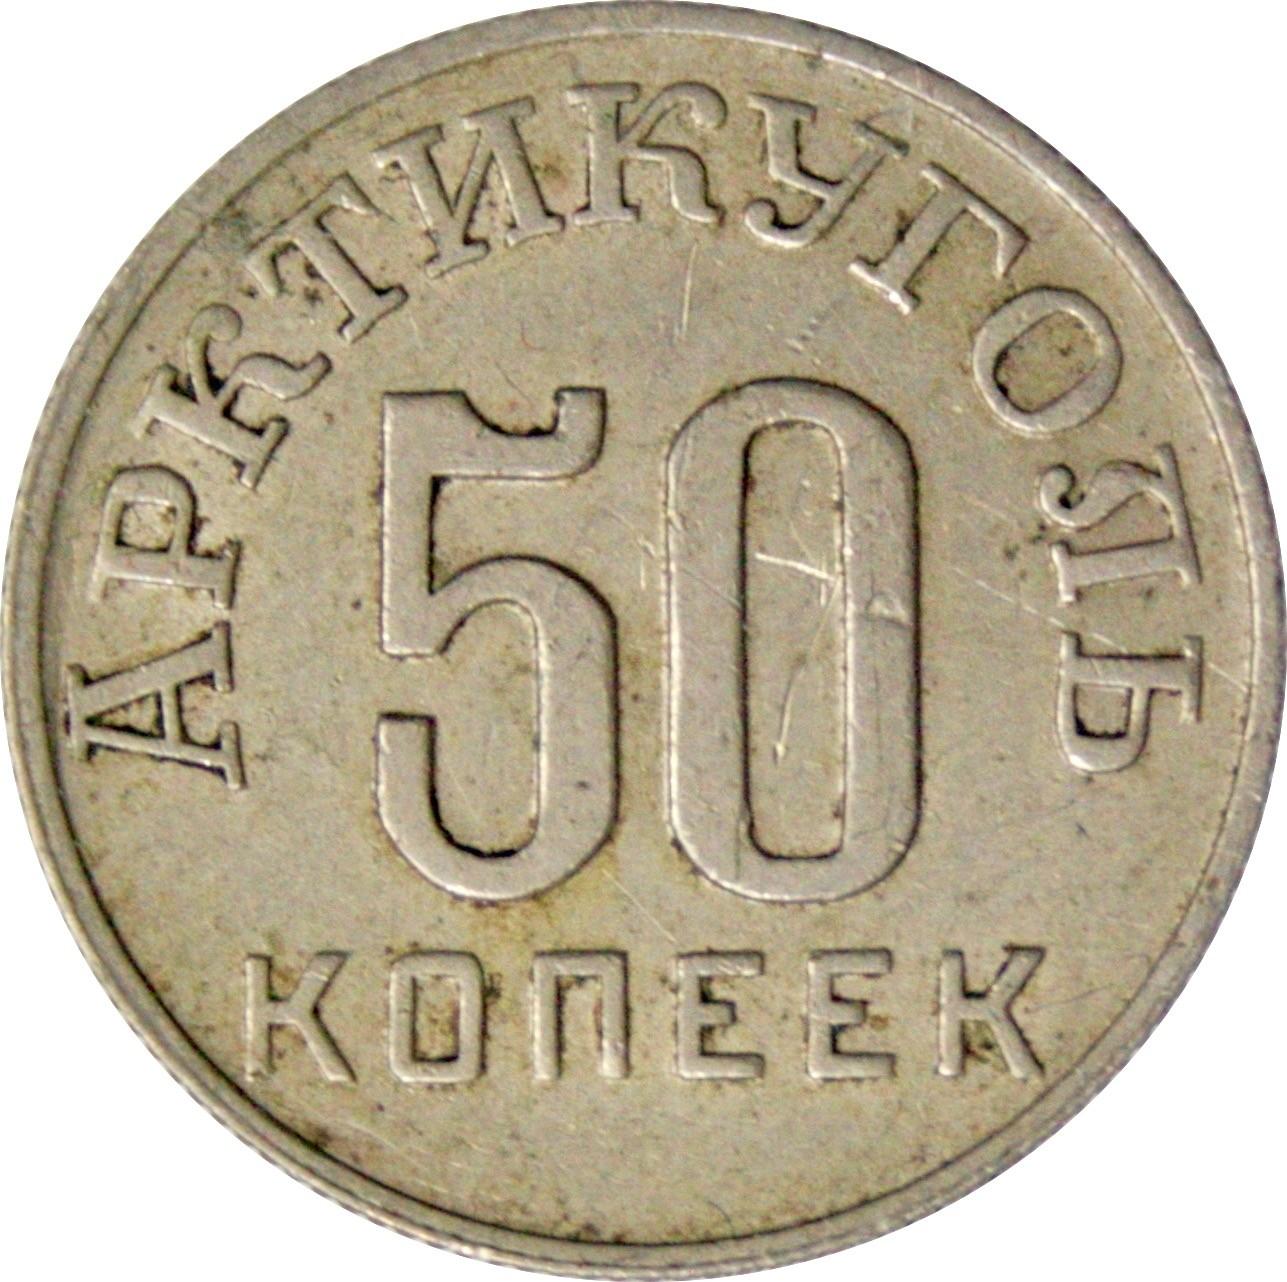 Spitzbergen, 50 kopek 1946